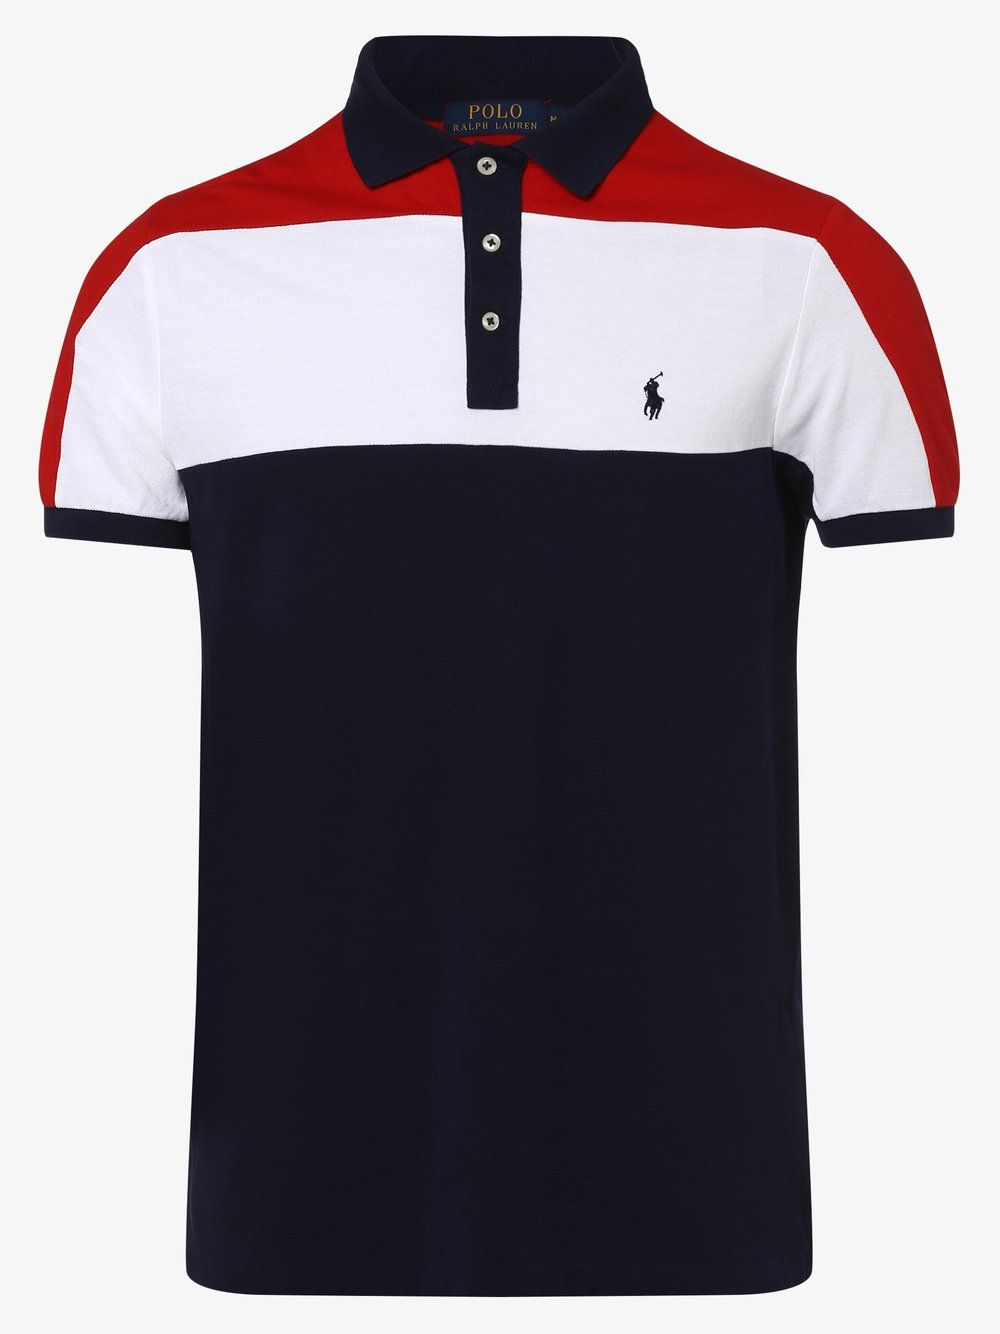 Polo Ralph Lauren Poloshirt Custom Slim Fit Blau In 2020 Polo Ralph Lauren Polo Ralph Und Ralph Lauren Poloshirt